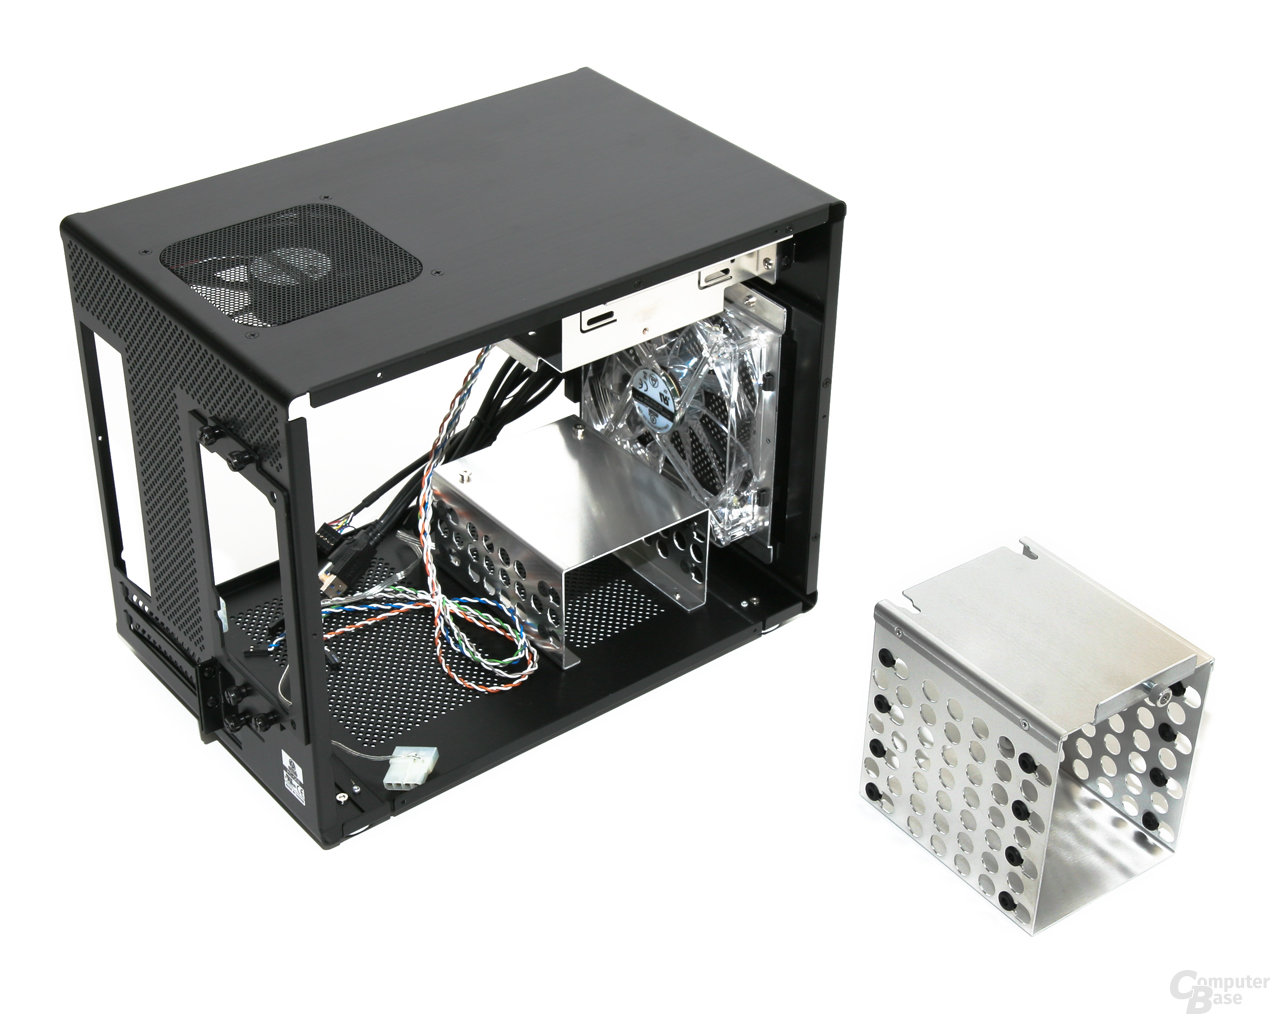 Lian Li PC-Q08 – Demontierter Festplattenkäfig